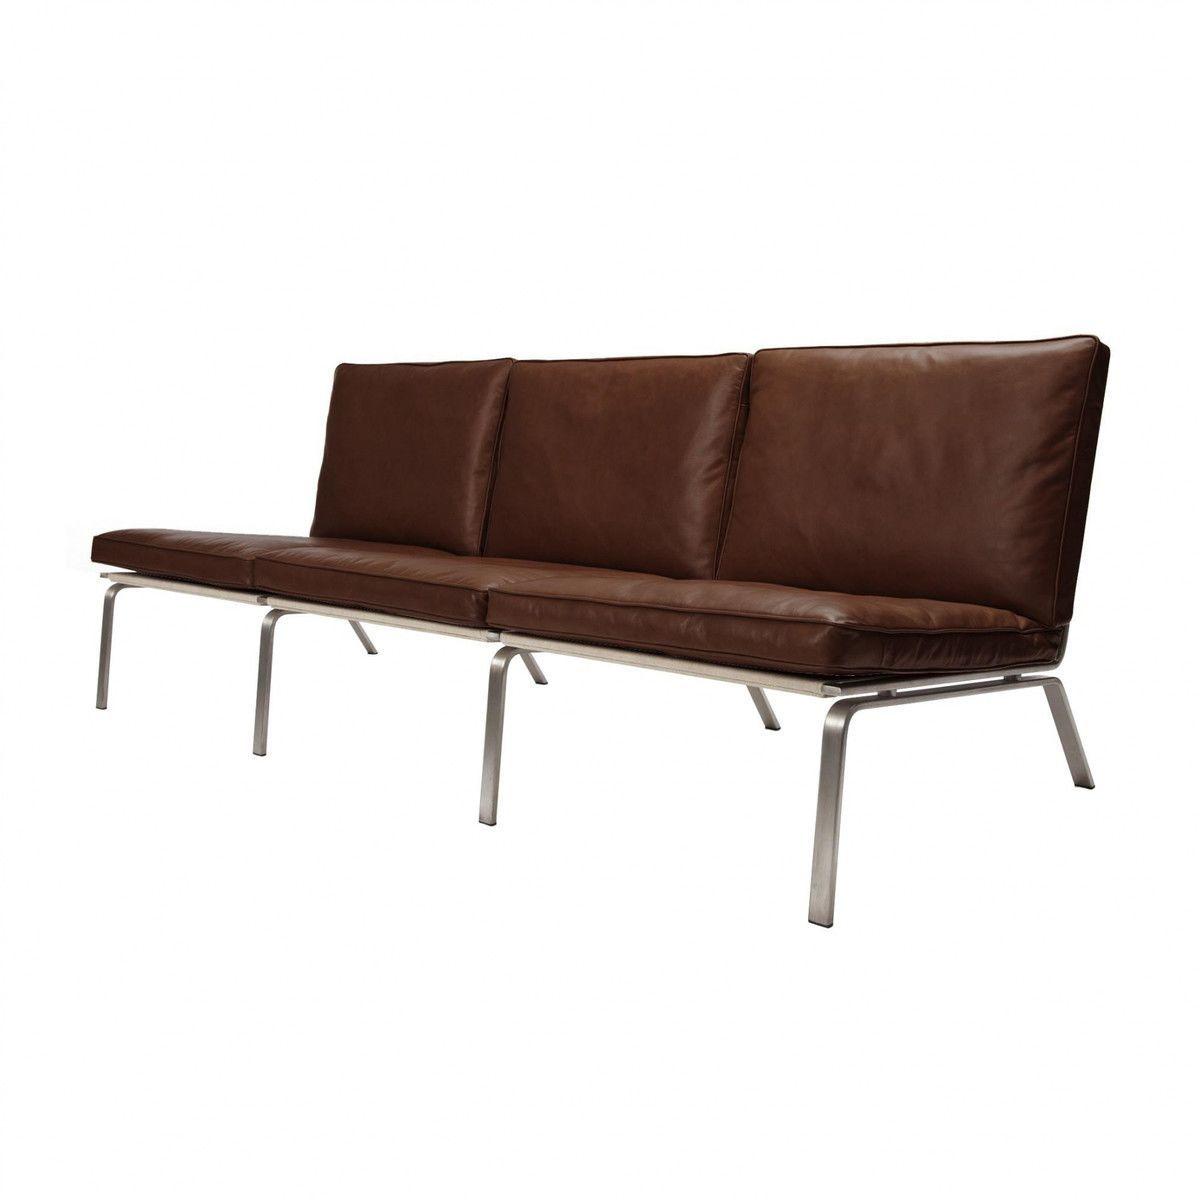 Best Norr Man Lounge Seater Sofa Premium Leather Brown With Sofa Leder Braun